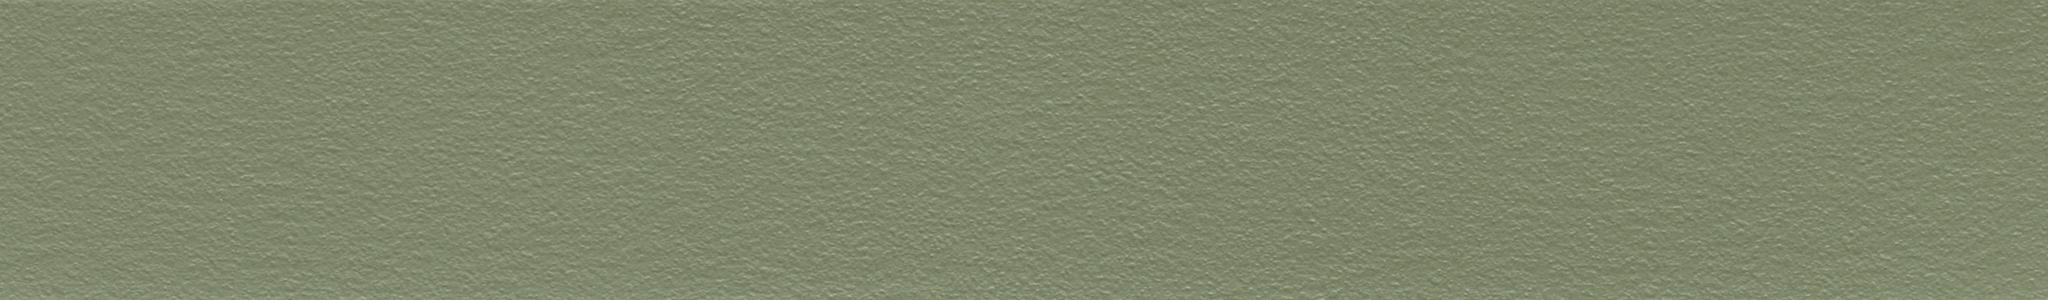 HU 163508 ABS Edge Green Soft Pearl 107